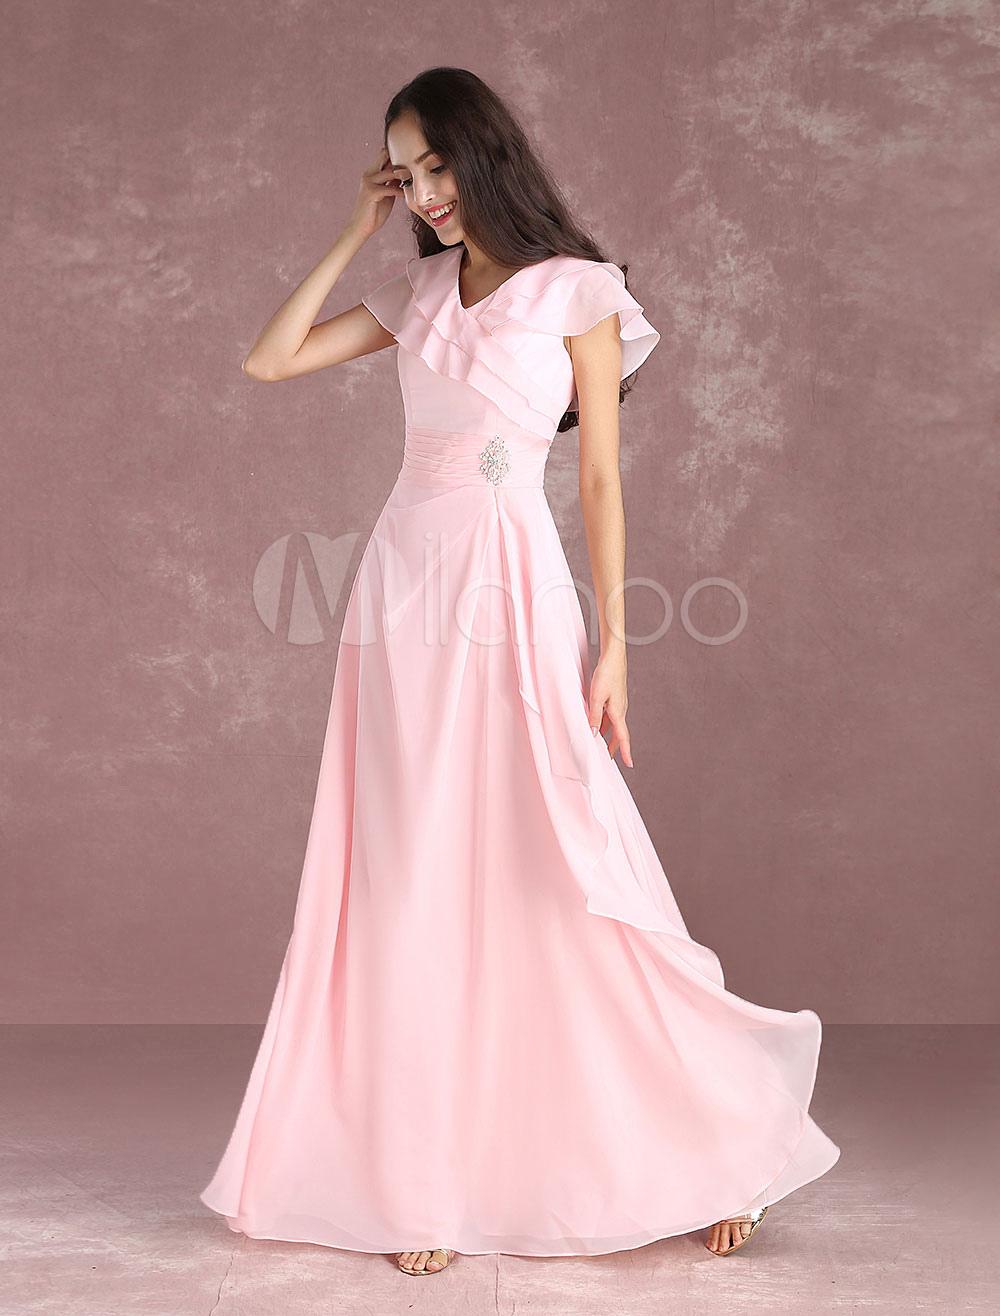 Chiffon Bridesmaid Dresses Soft Pink Beading Long Prom Dresses V Neck Short Sleeve Pleated Floor Length Party Dress (Wedding) photo